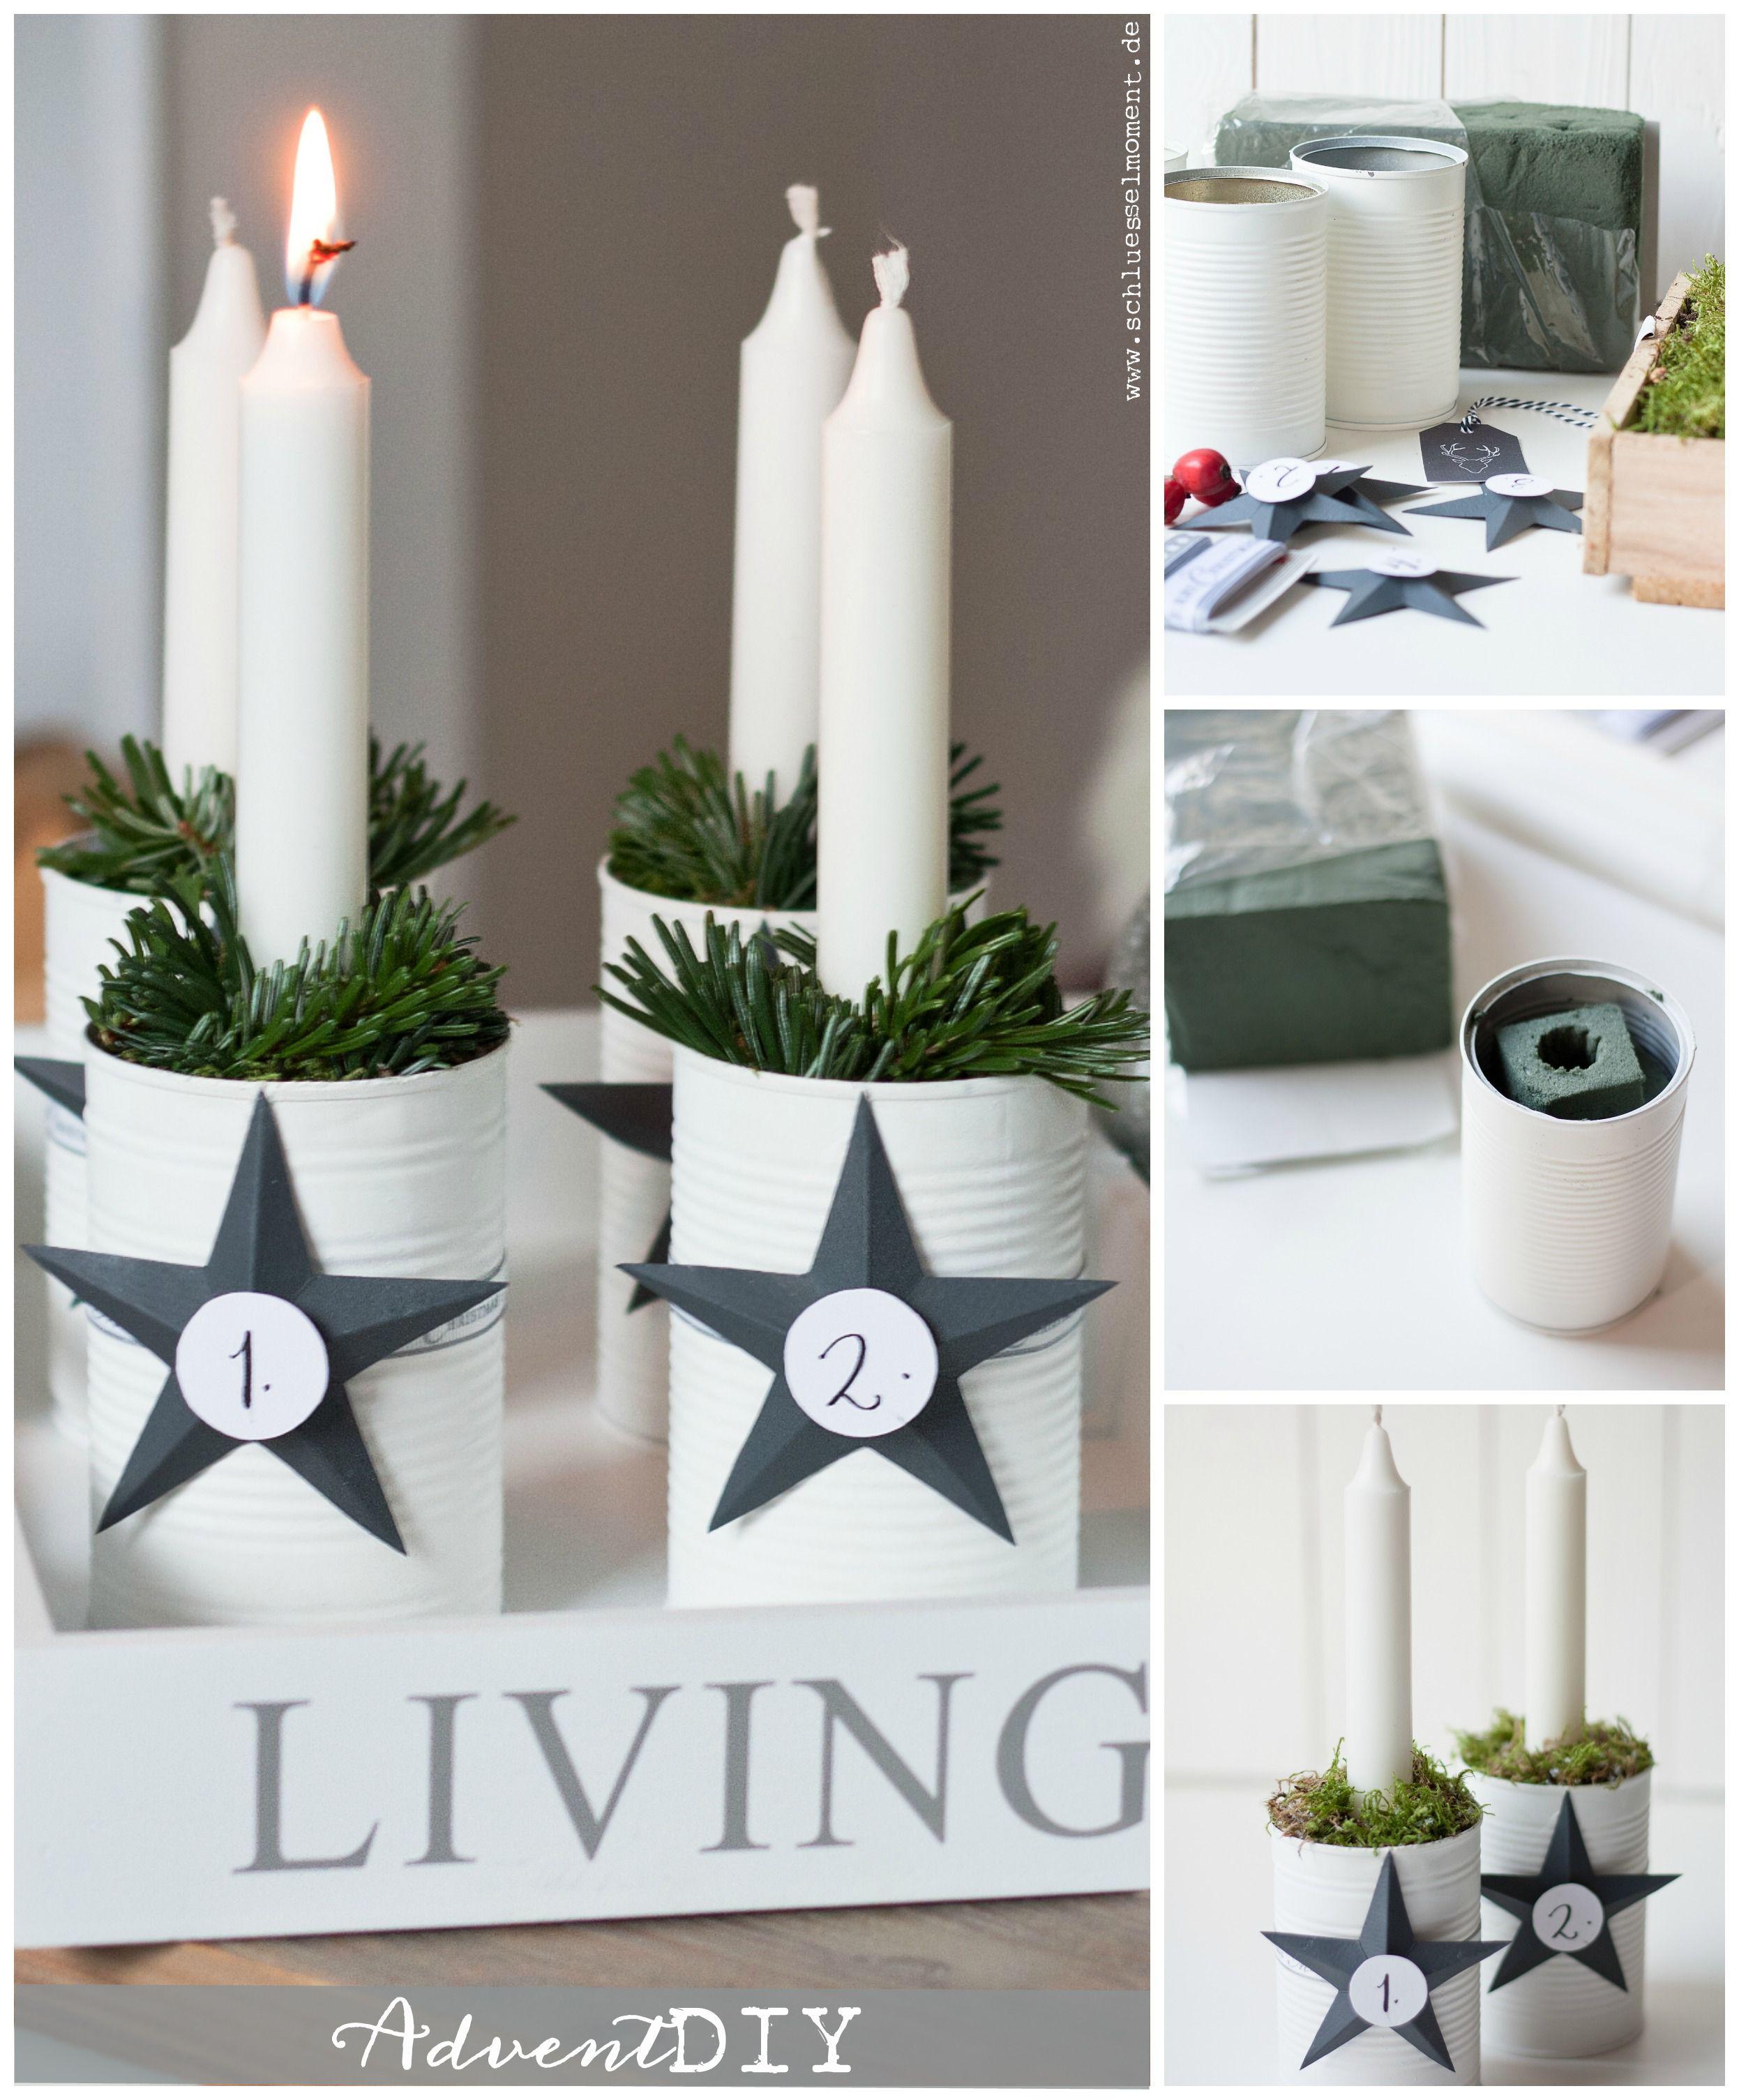 diy advent wreath moderner adventskranz aus dosen my. Black Bedroom Furniture Sets. Home Design Ideas